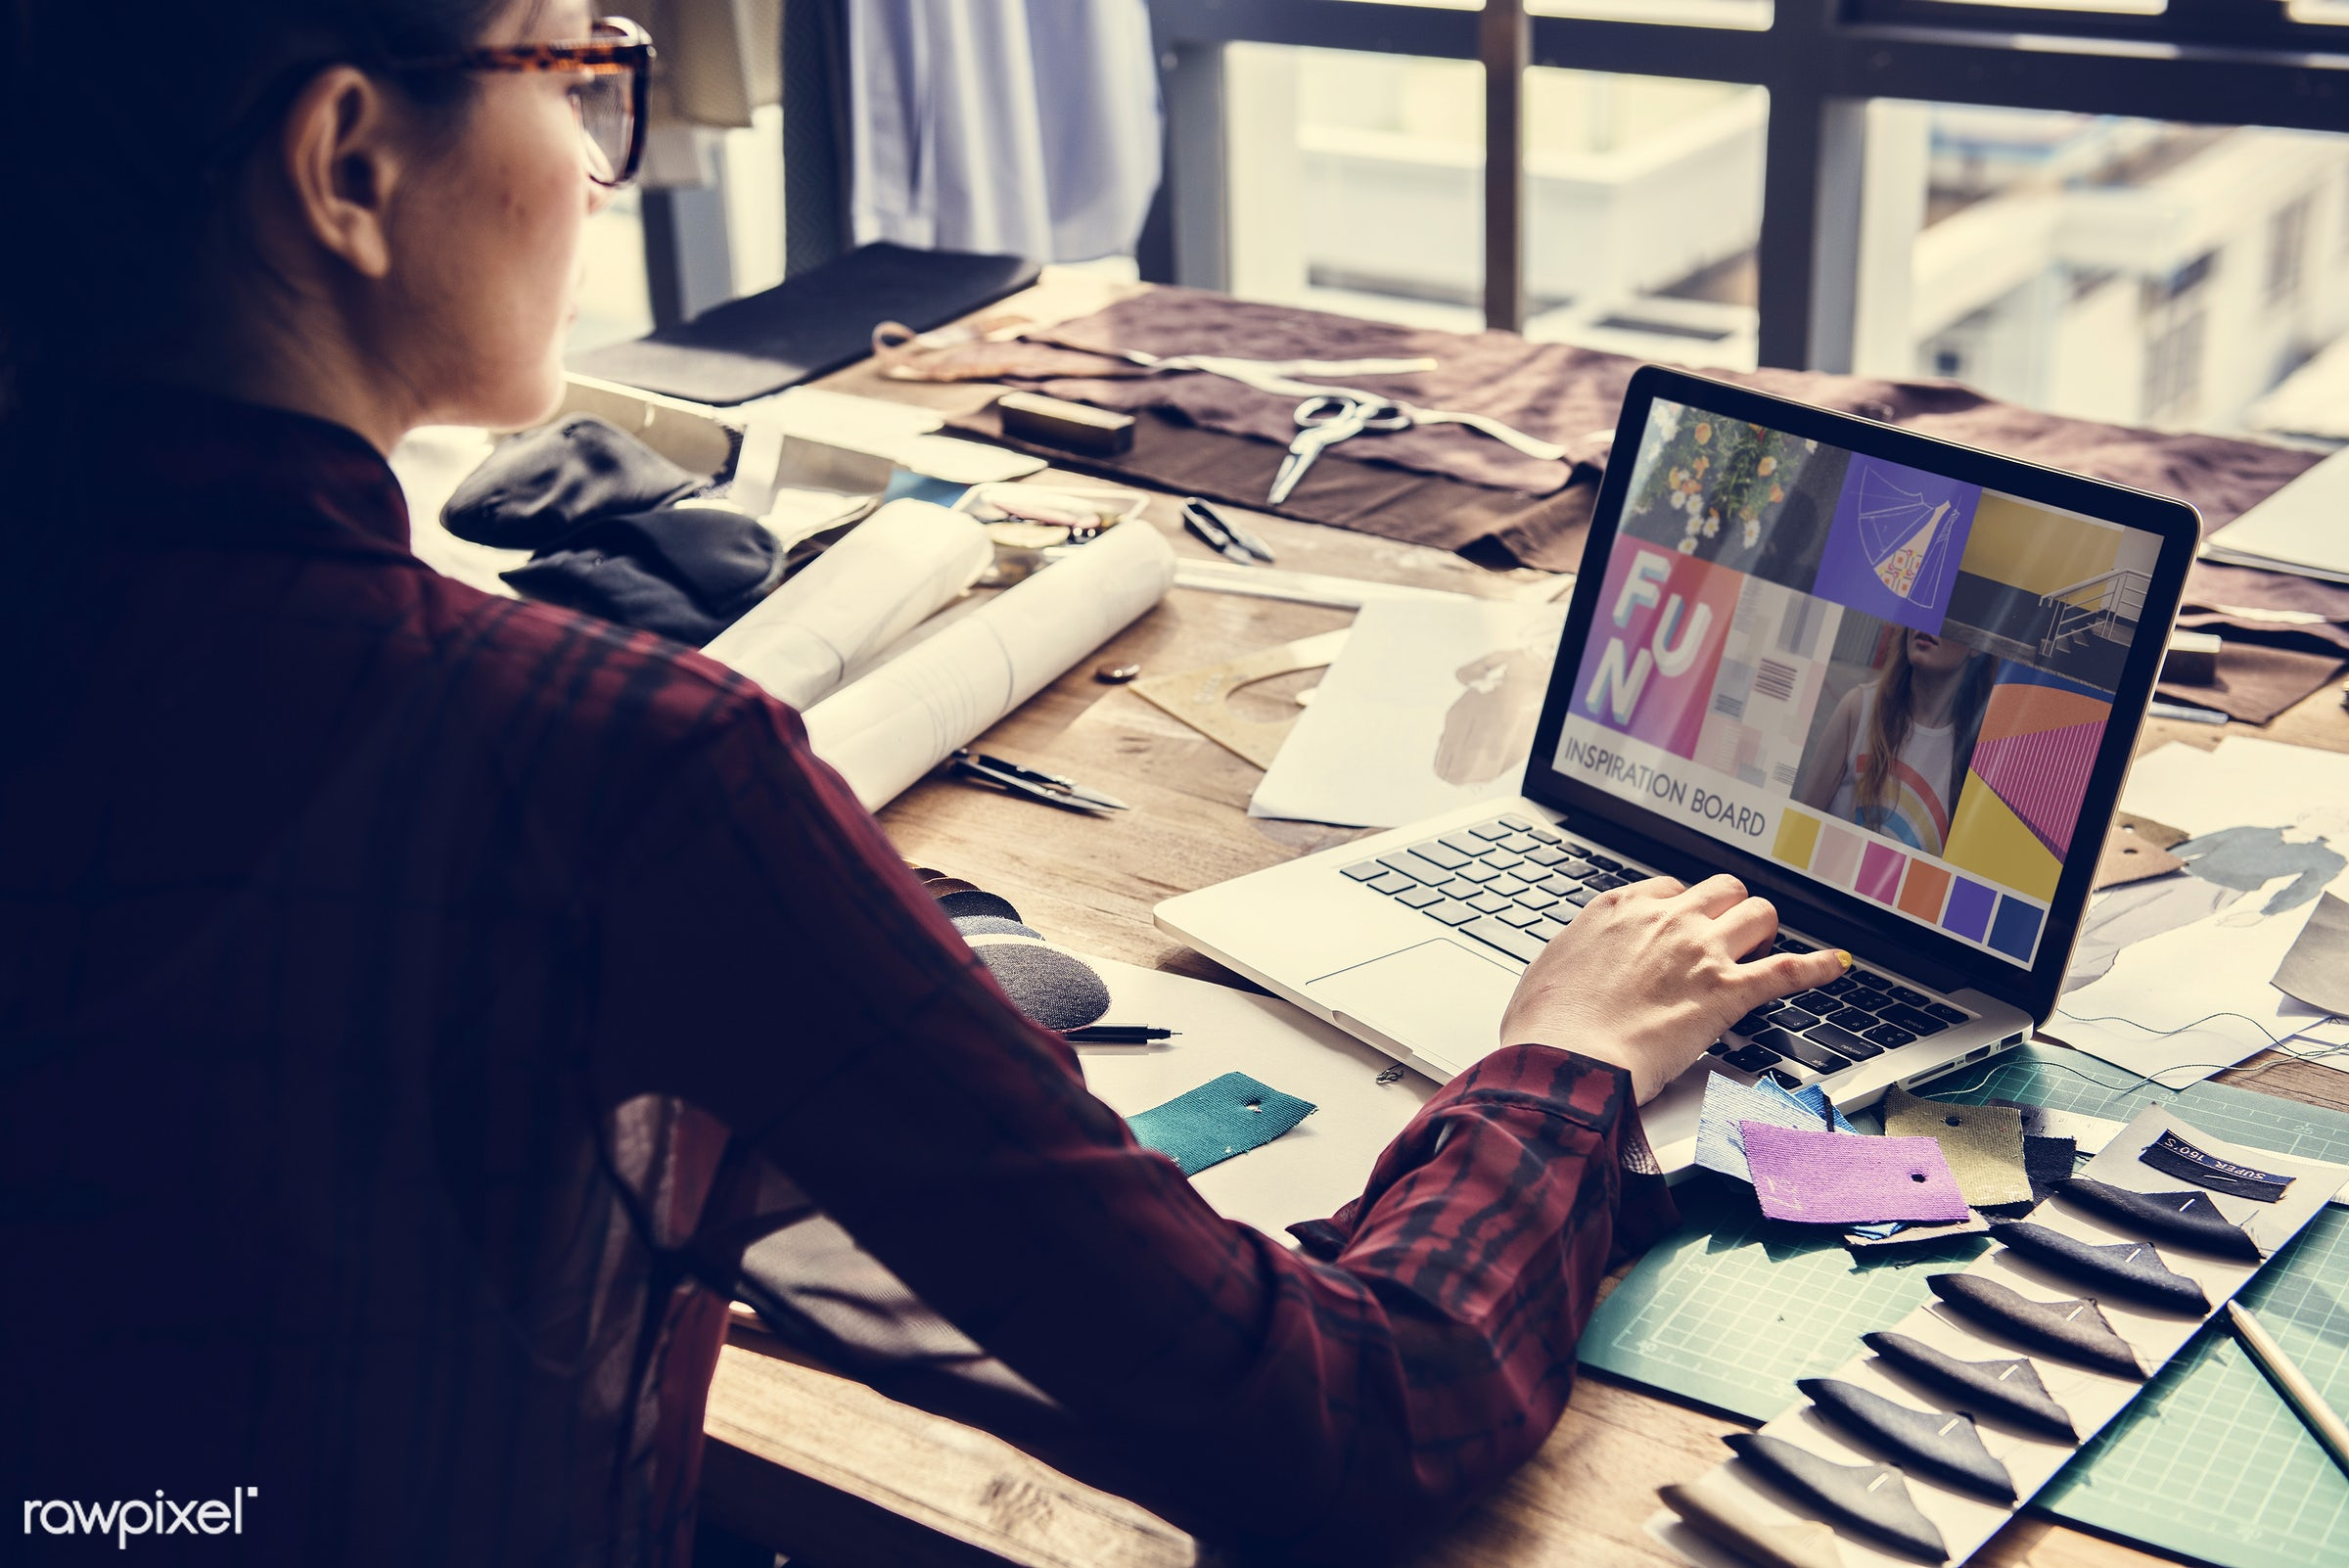 trends, studio, computer, reflection, person, idea, concept, fashion, technology, designing, profession, comparing, seeking...